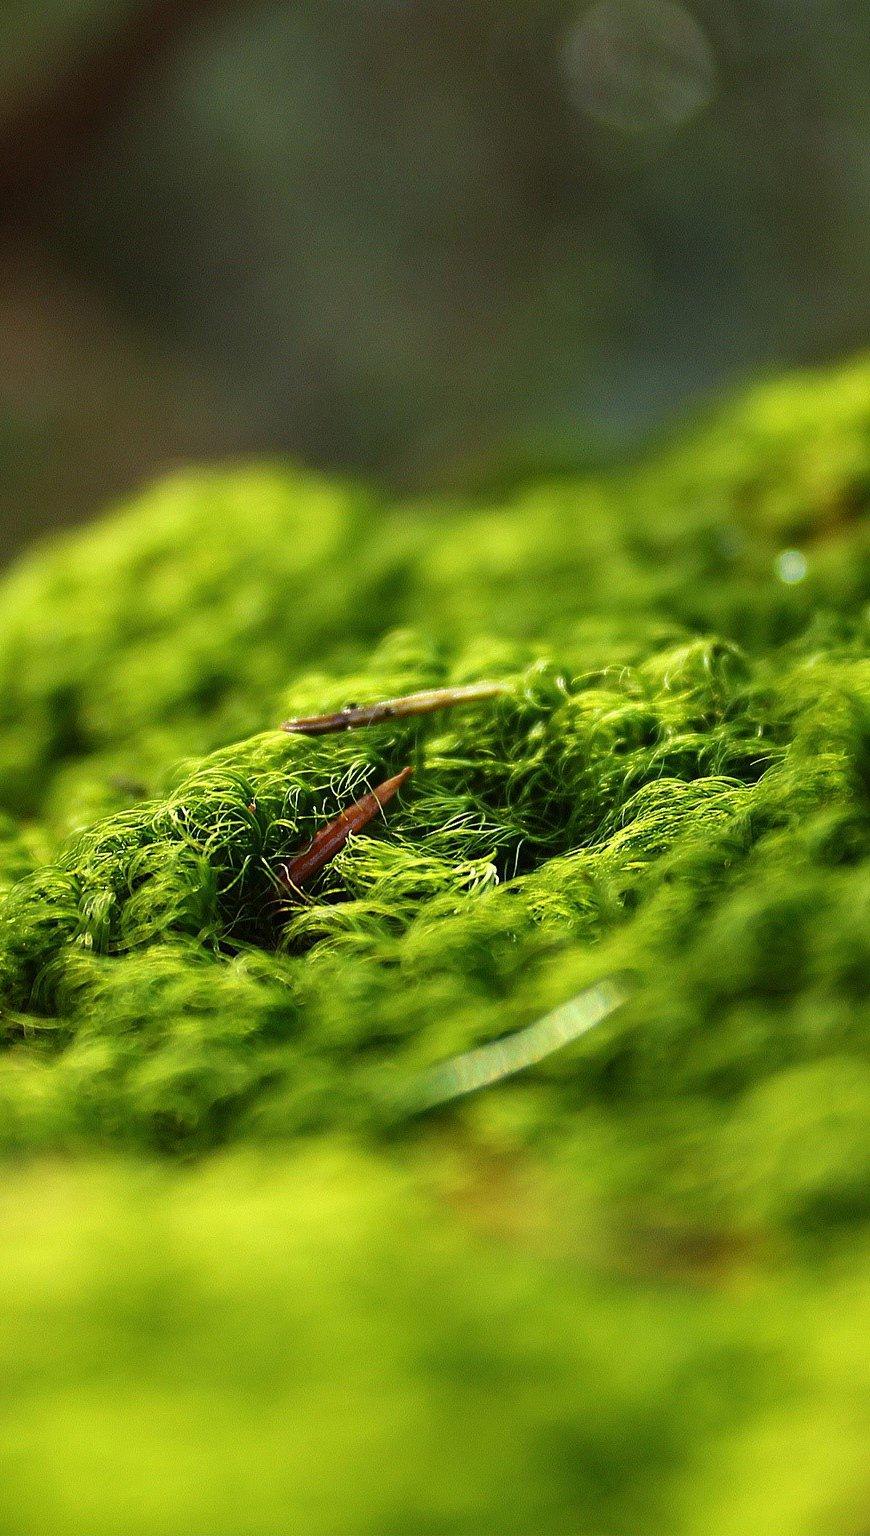 Fondos de pantalla Bosque en primavera Vertical